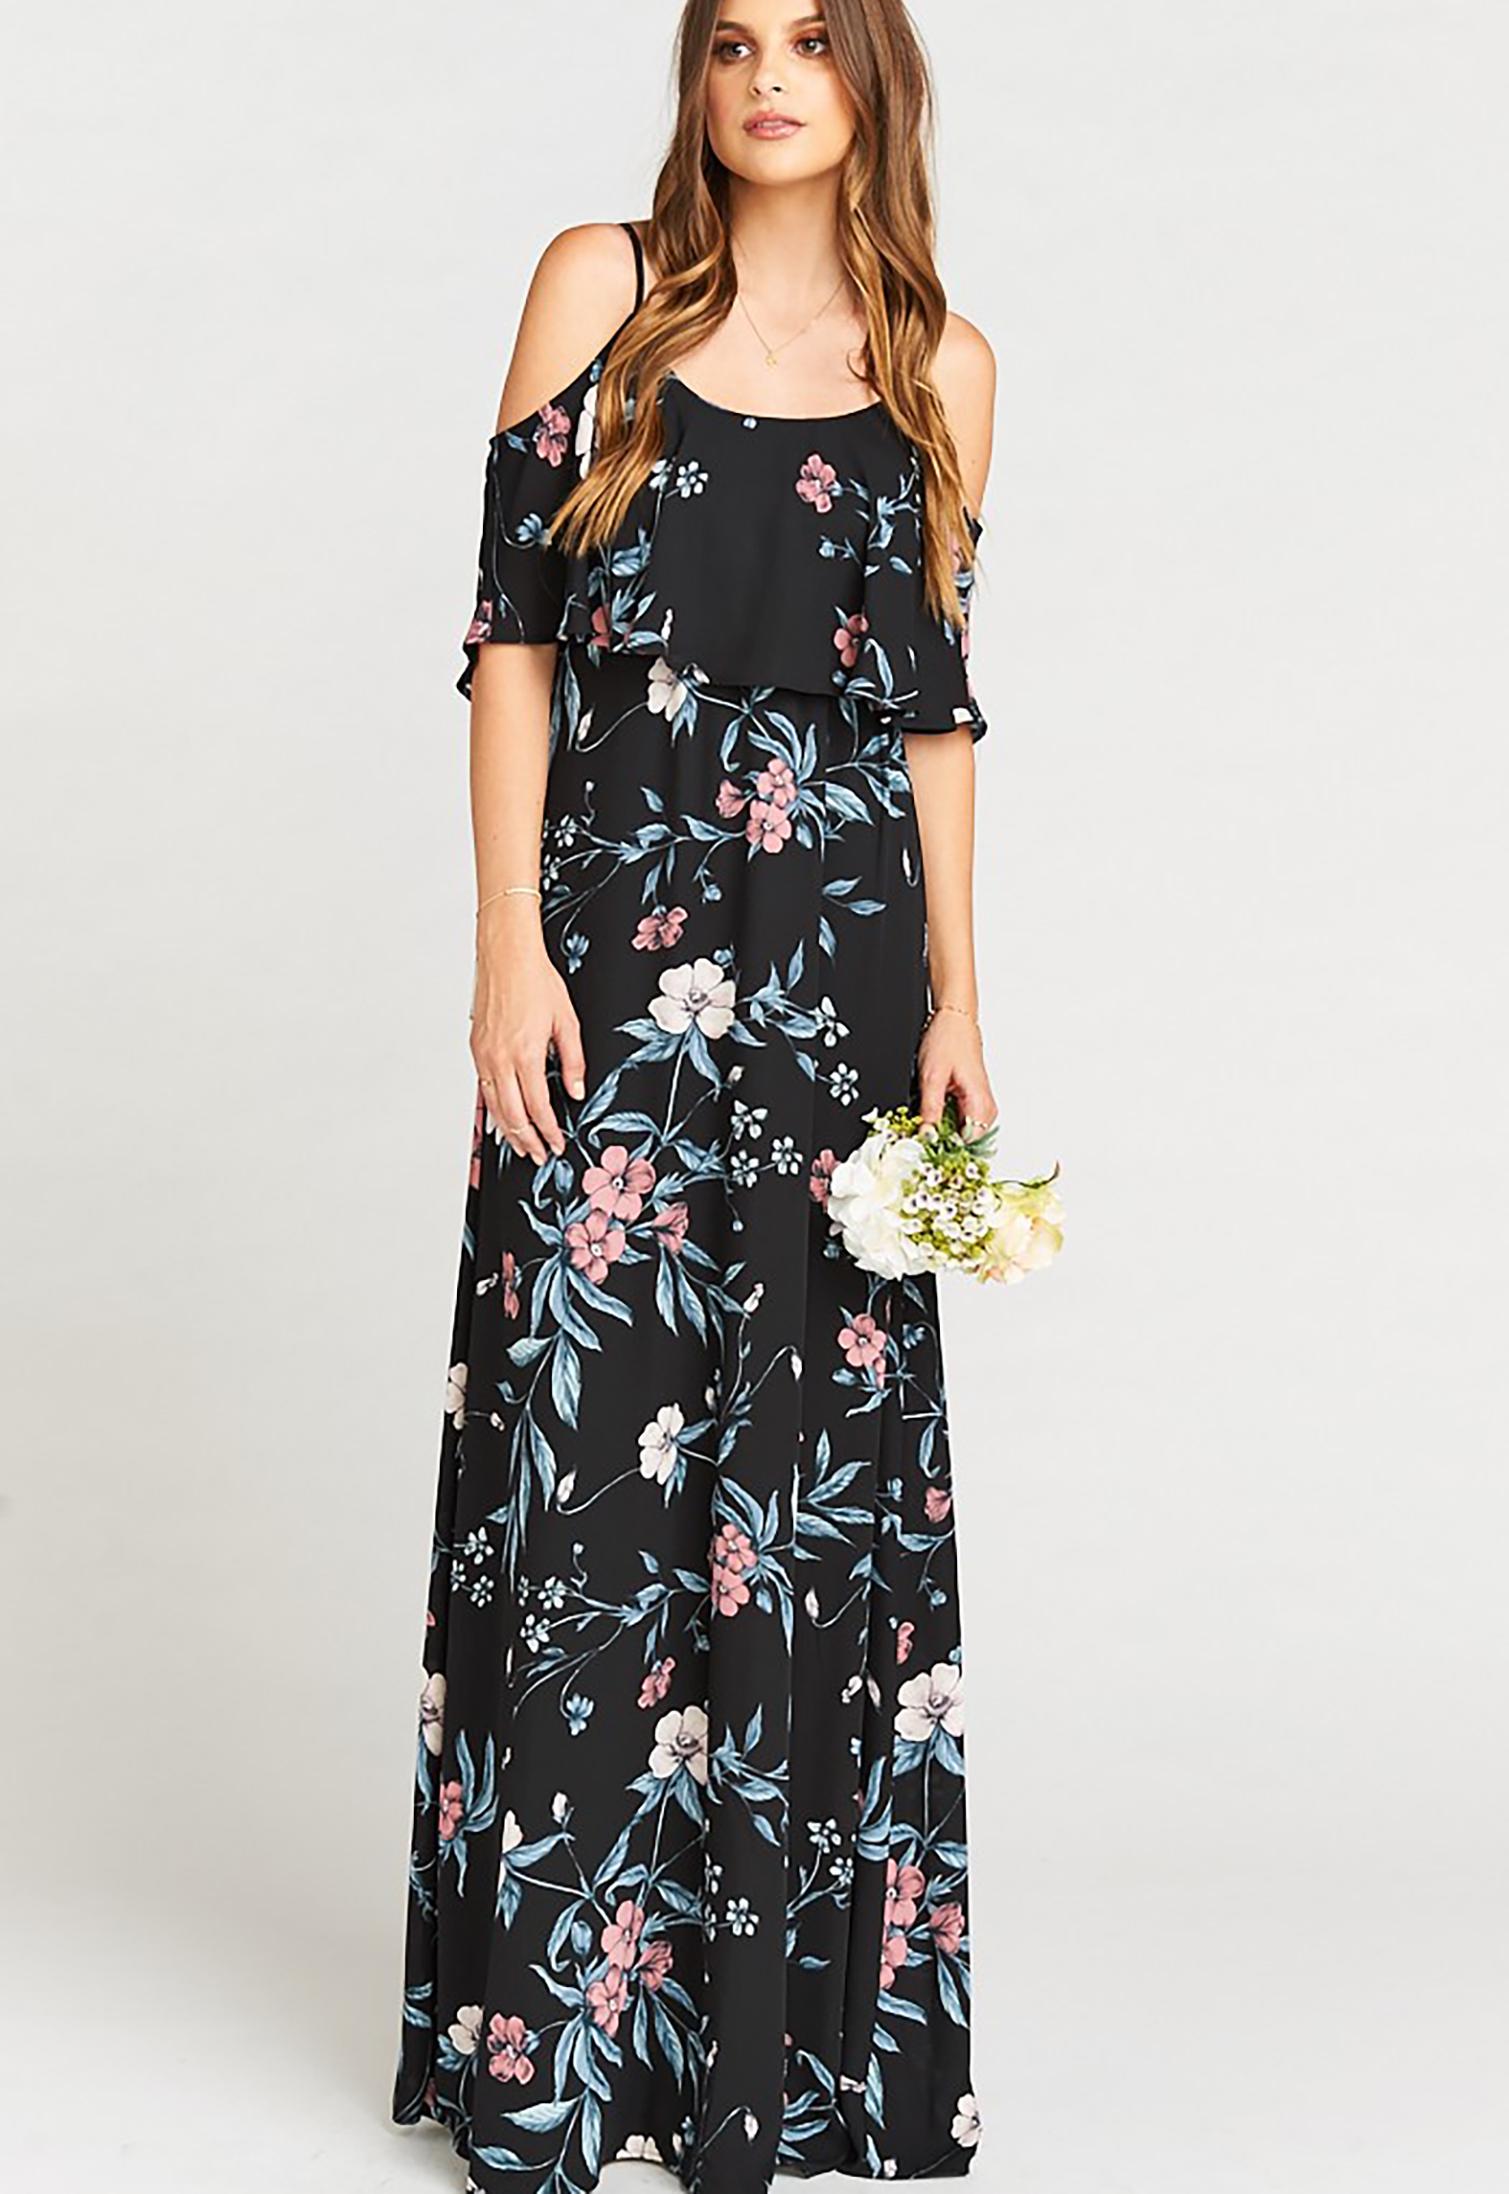 Caitlin ruffle maxi dress green wedding shoes weddings for Shoes for maxi dress wedding